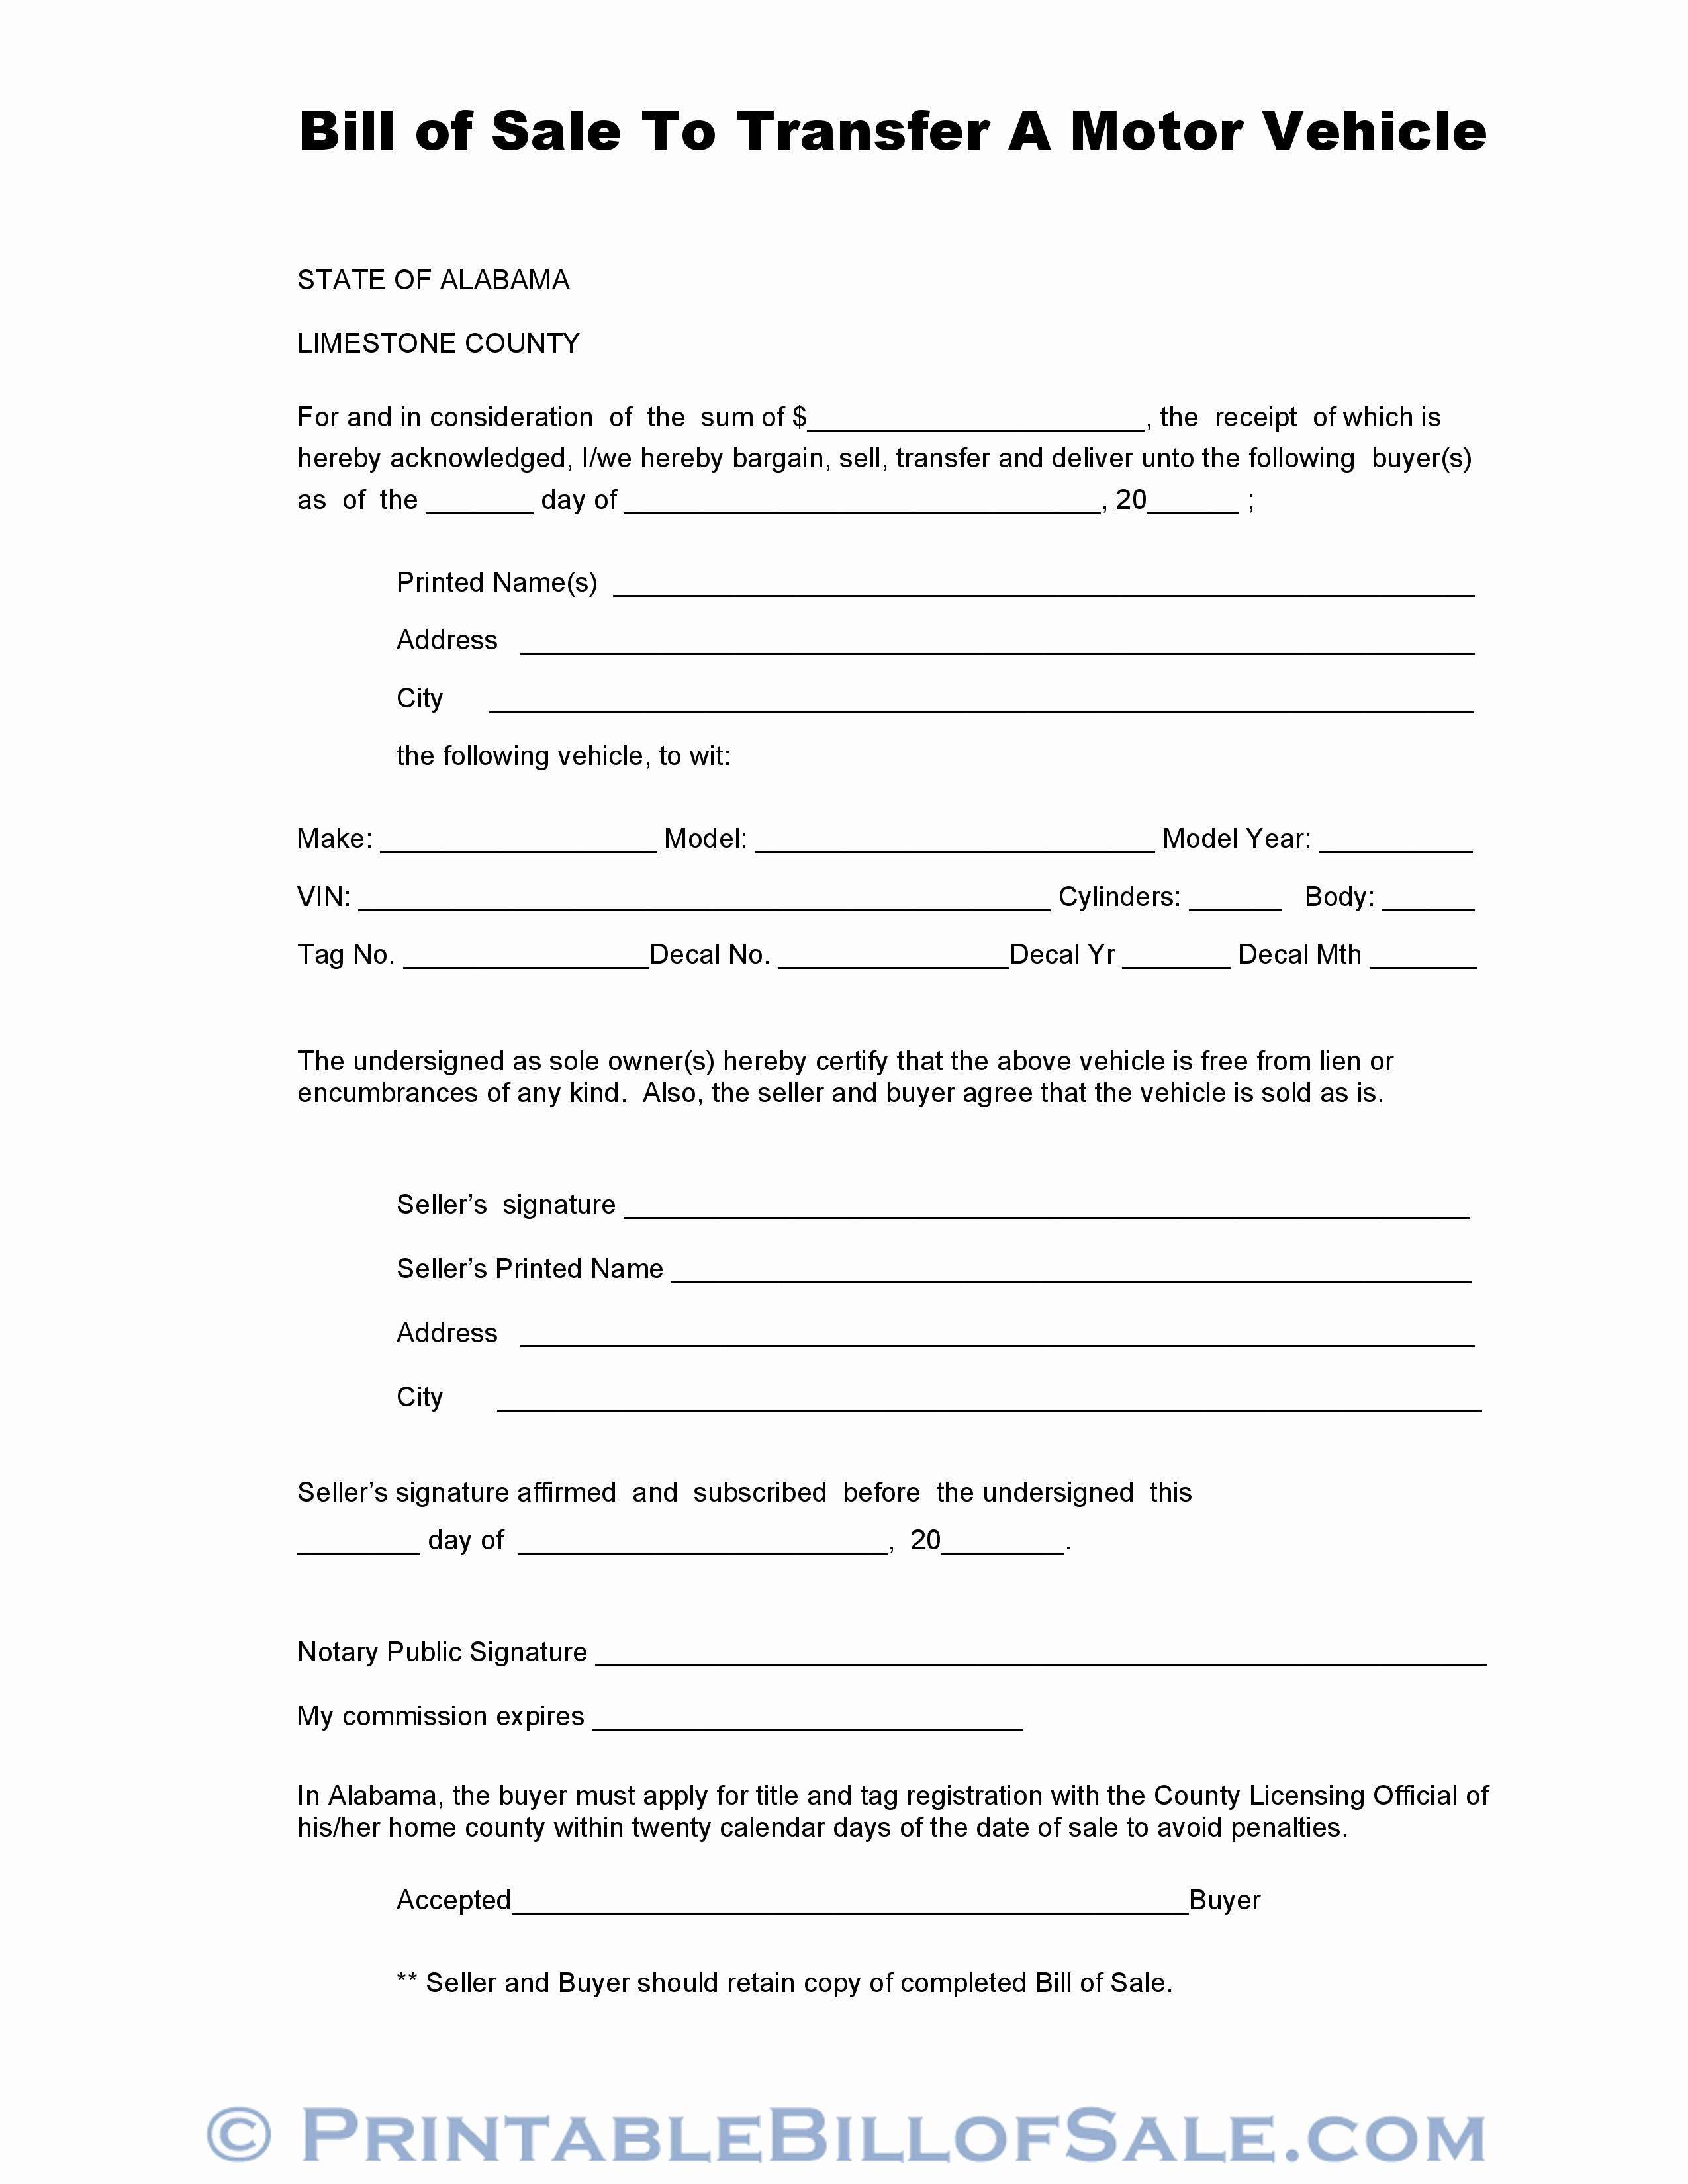 Auto Bill Of Sale Illinois New Free Limestone County Alabama Vehicle Bill Of Sale form